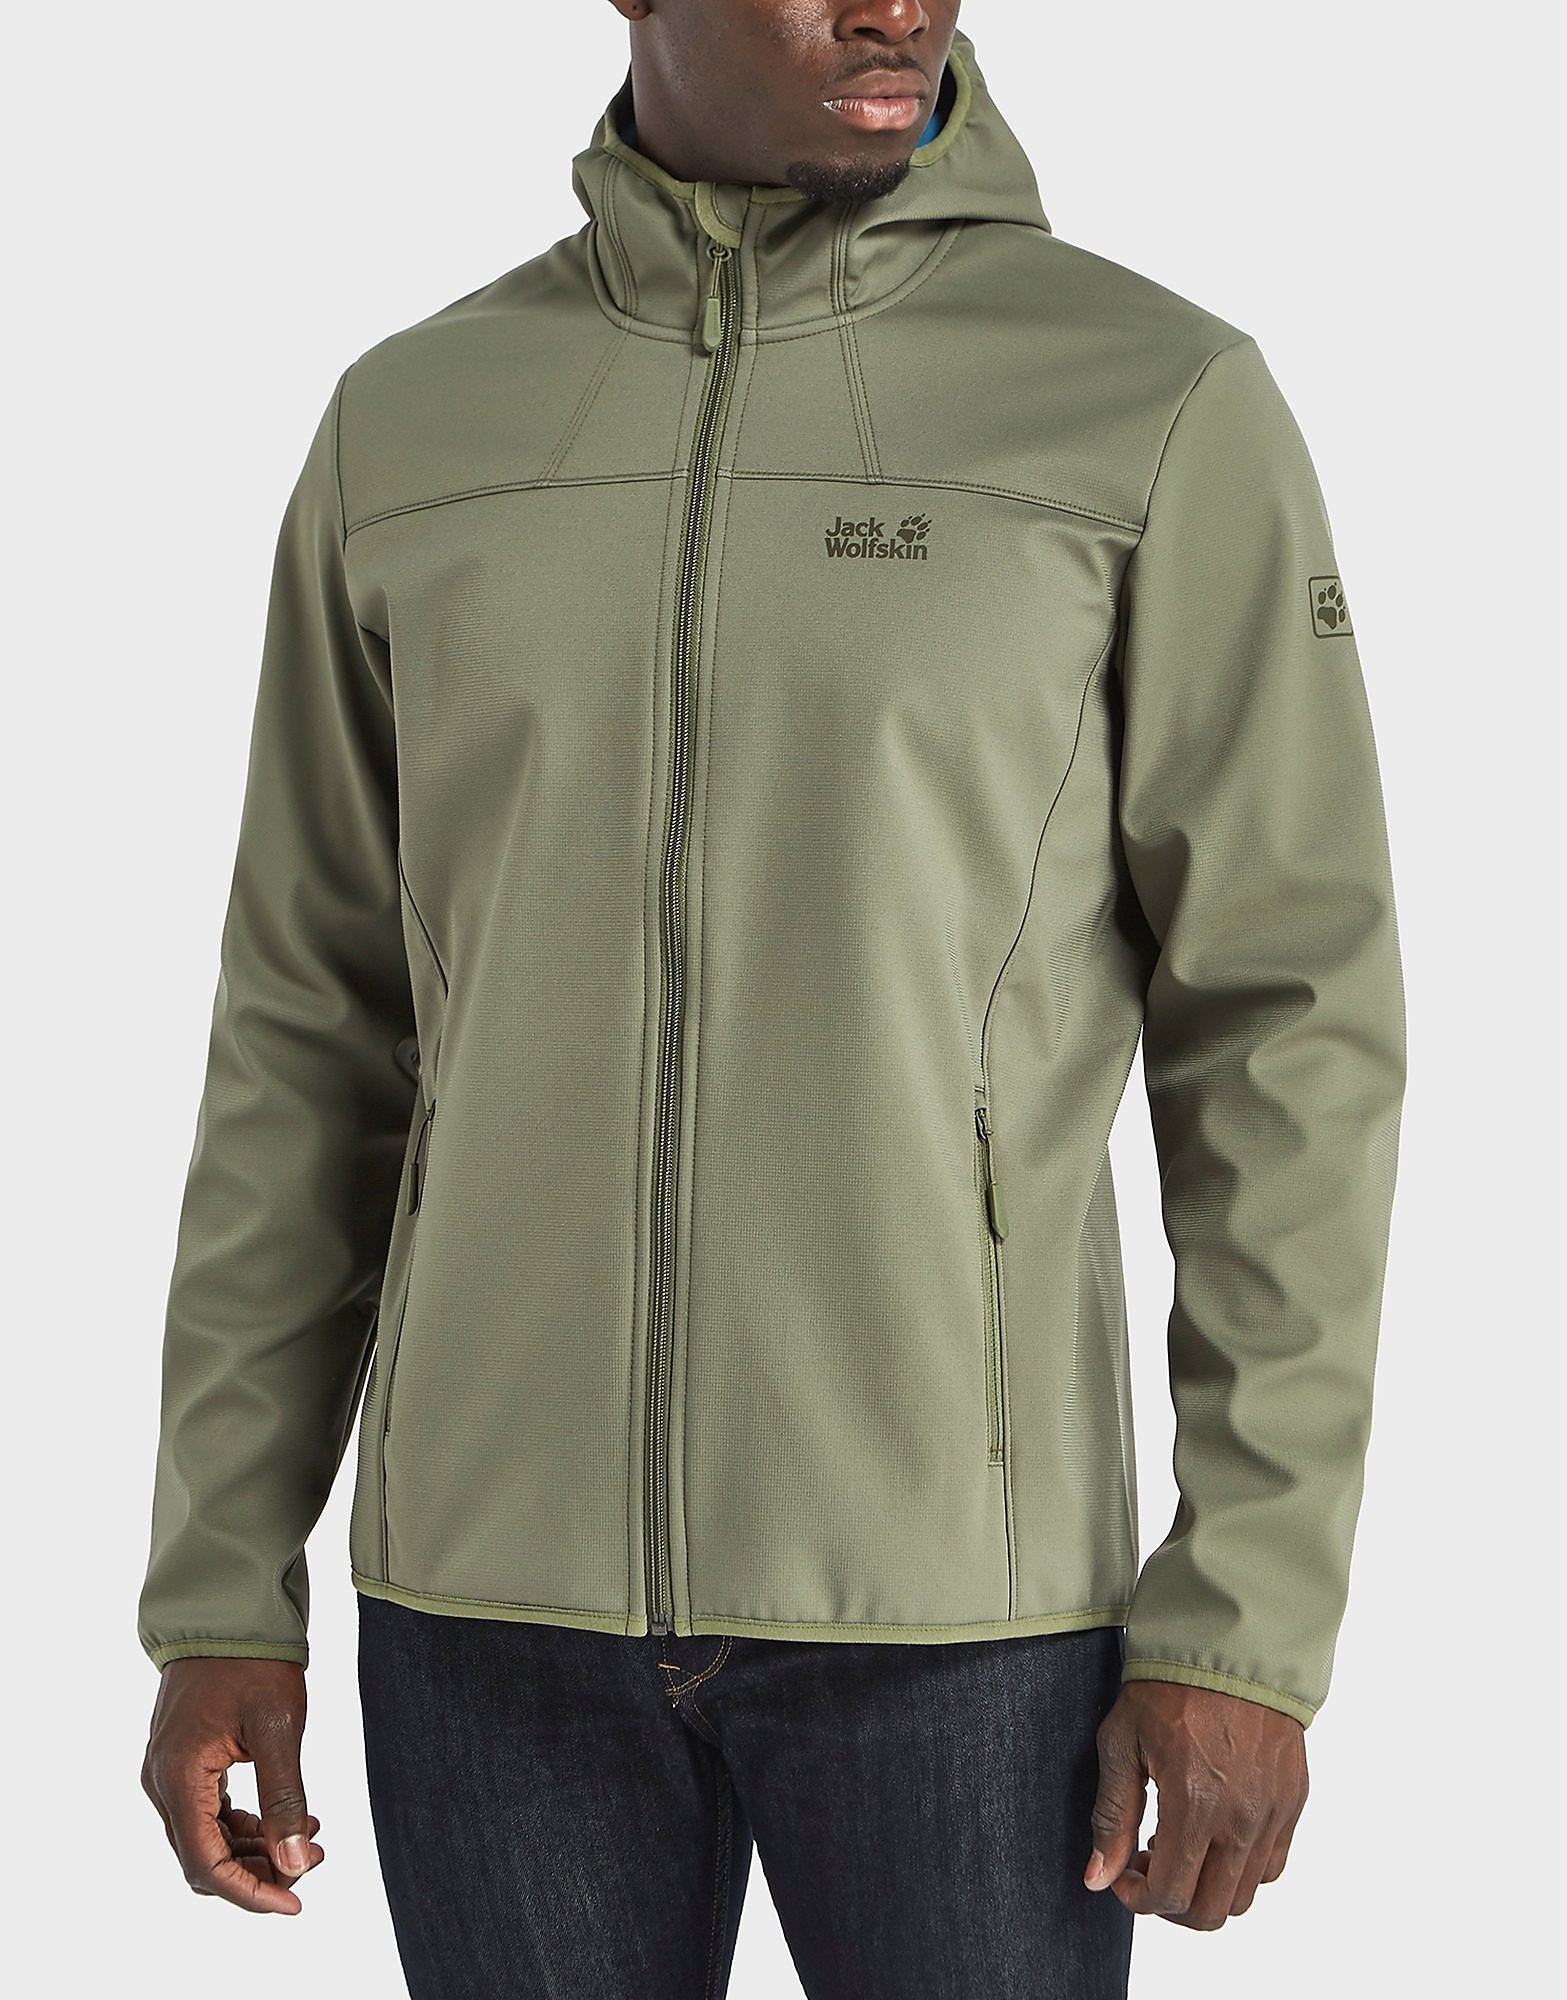 Jack Wolfskin Northen Shell Hooded Jacket